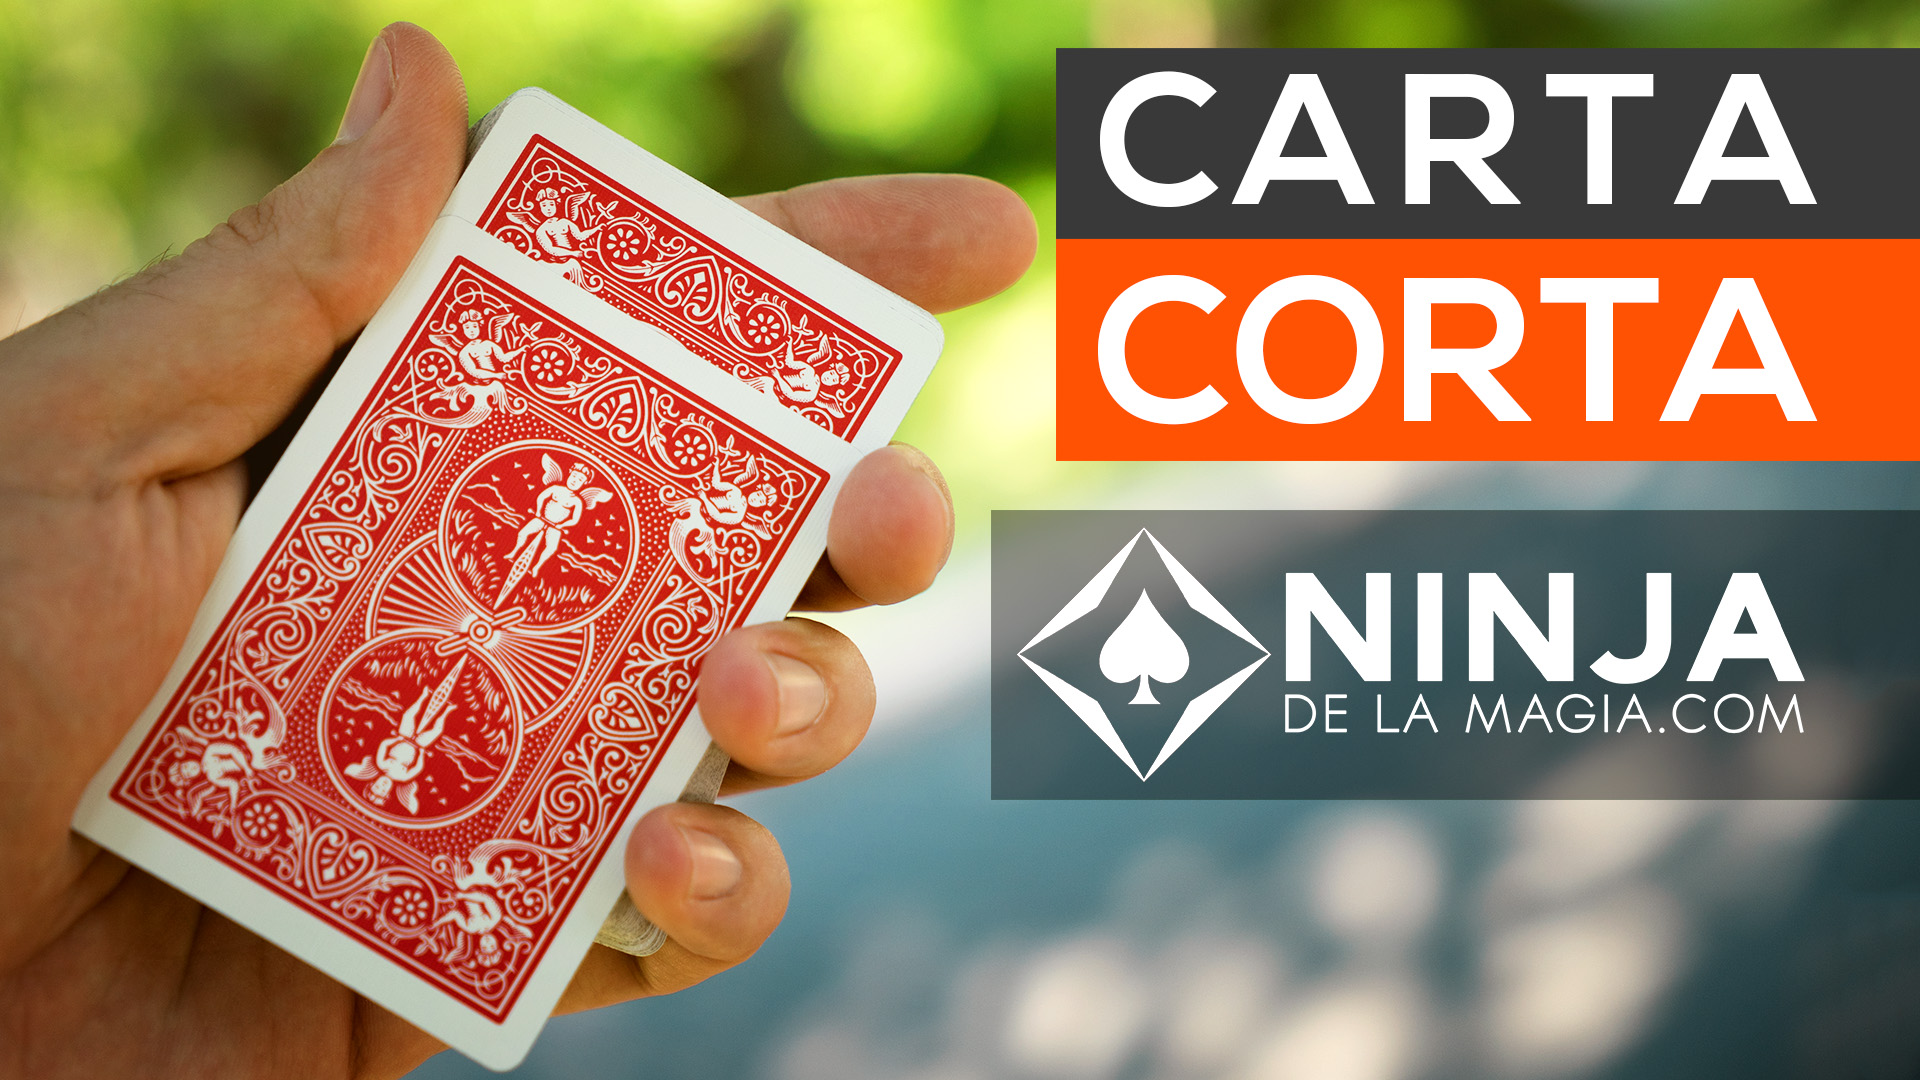 AMG 2014 - 20 - Carta Corta